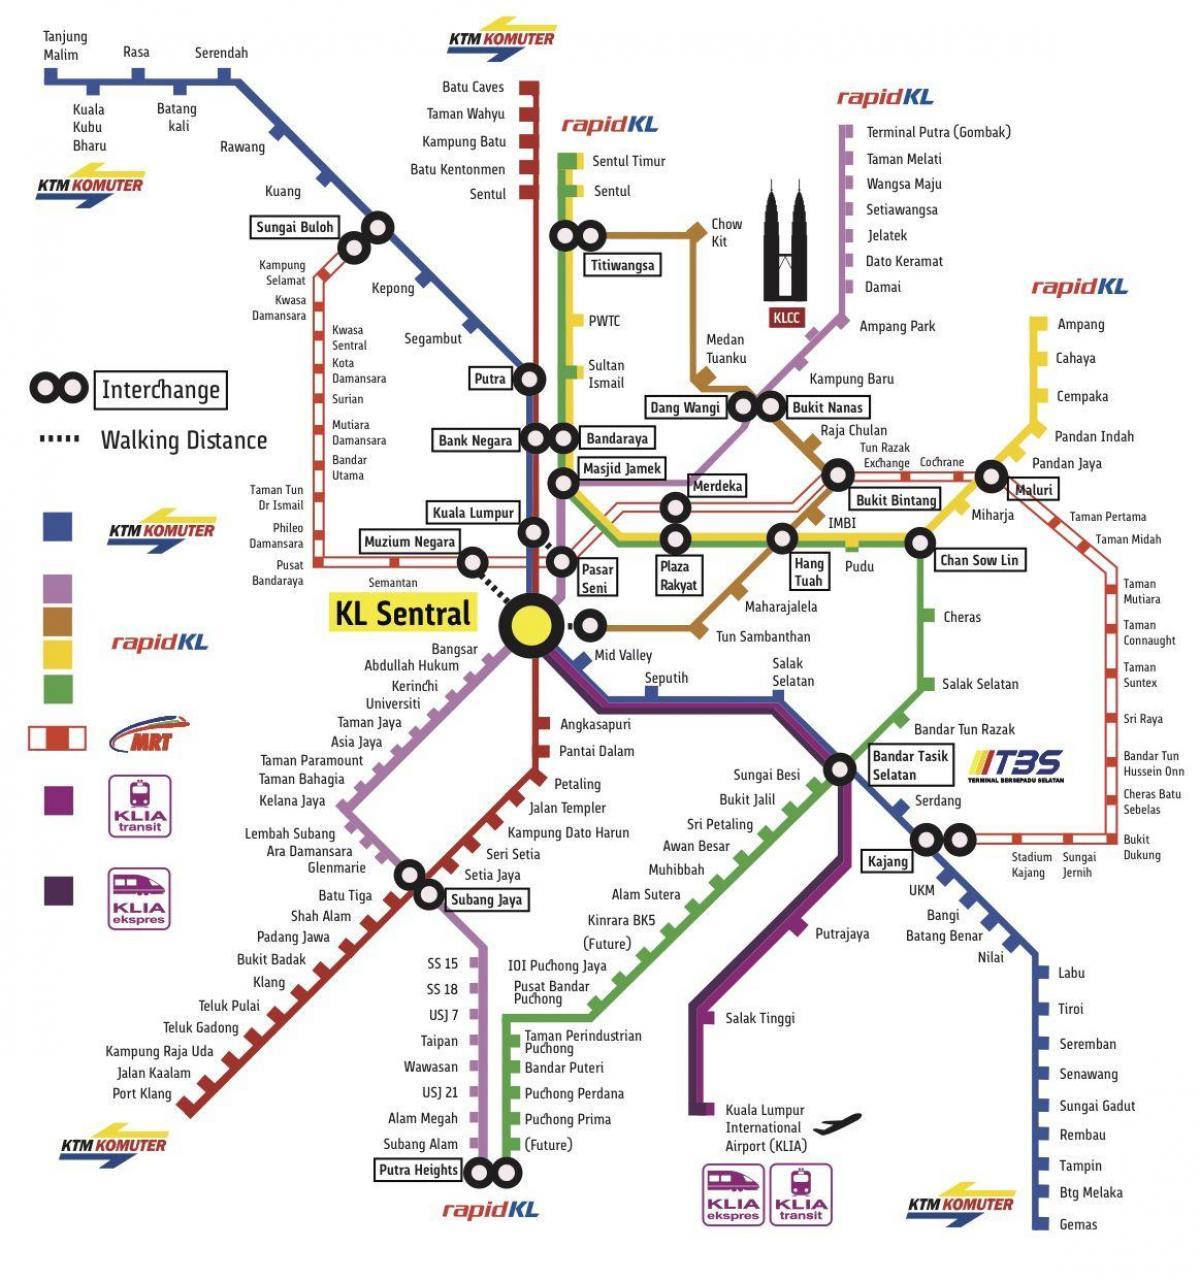 Kl Transport Kort Kuala Lumpur Transport Kort Malaysia